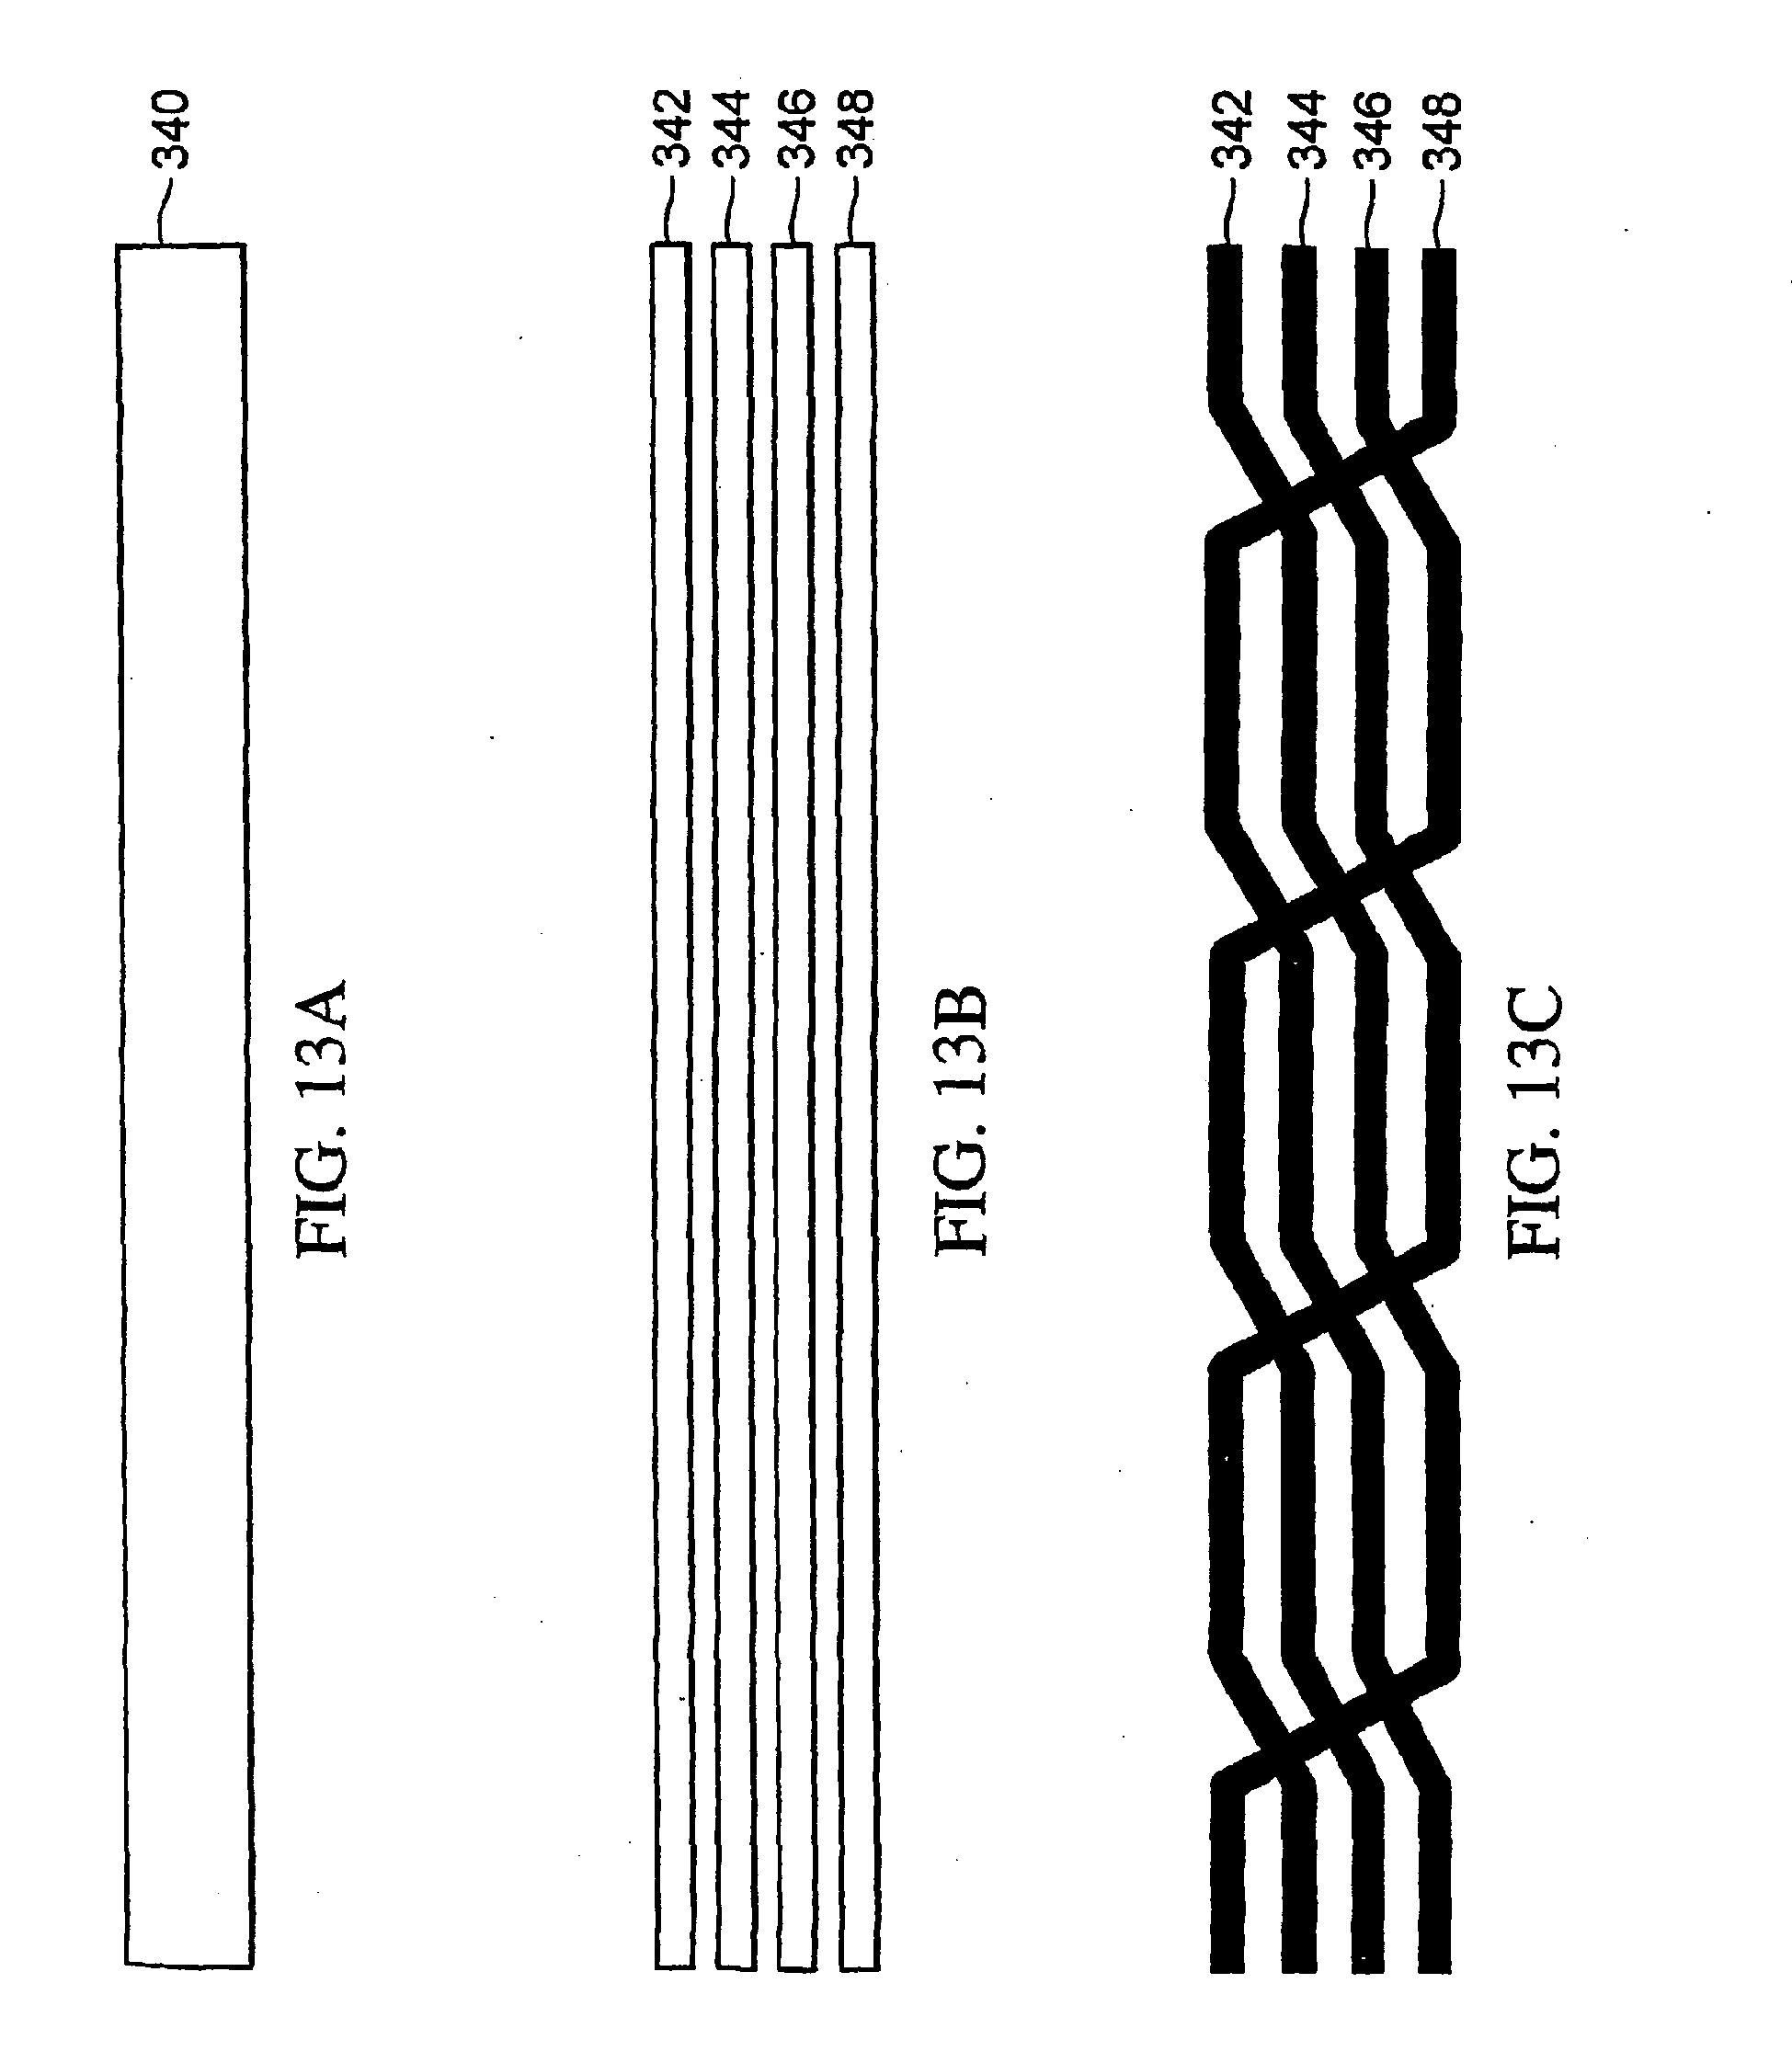 Patent EP1891700B1 True time delay phase array radar using – Honda Gx630 Wire Diagram